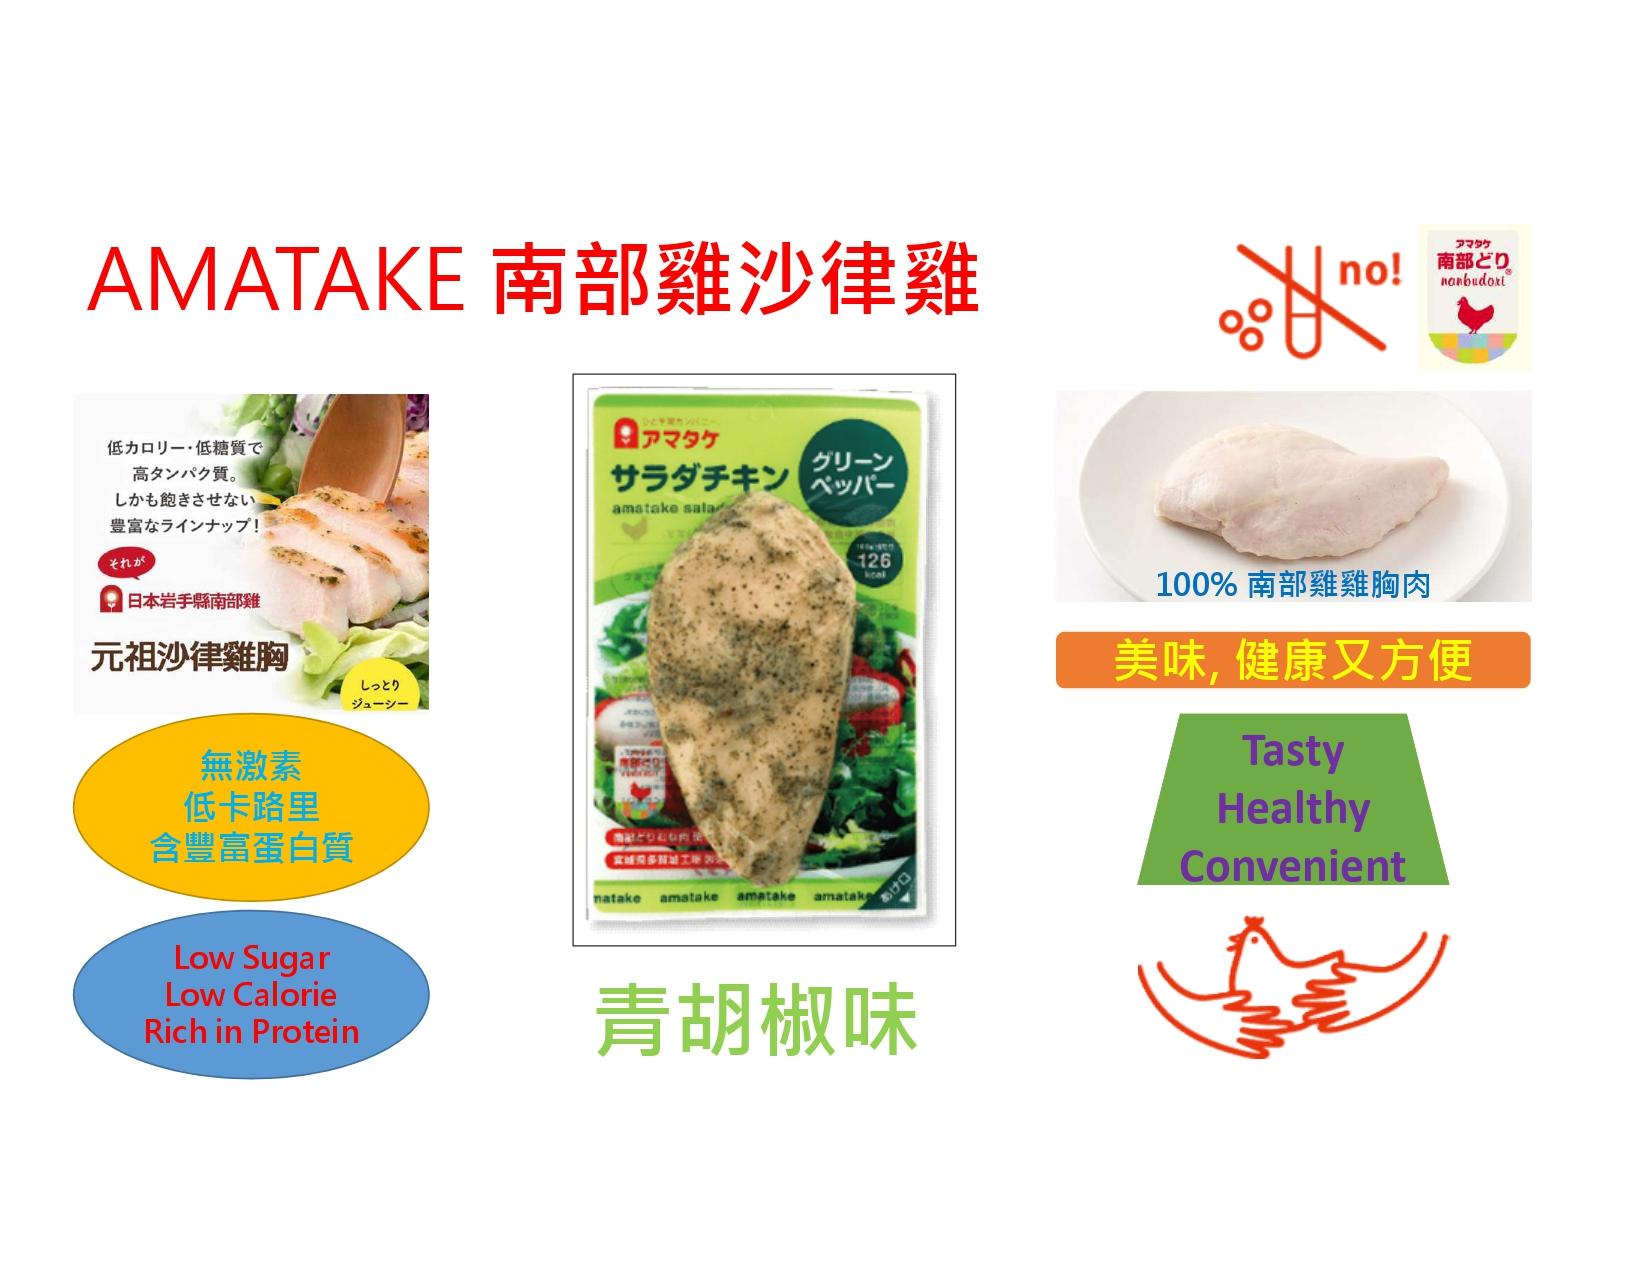 南部雞沙律雞 店鋪 CATALOG (29-08-20)_page-0004